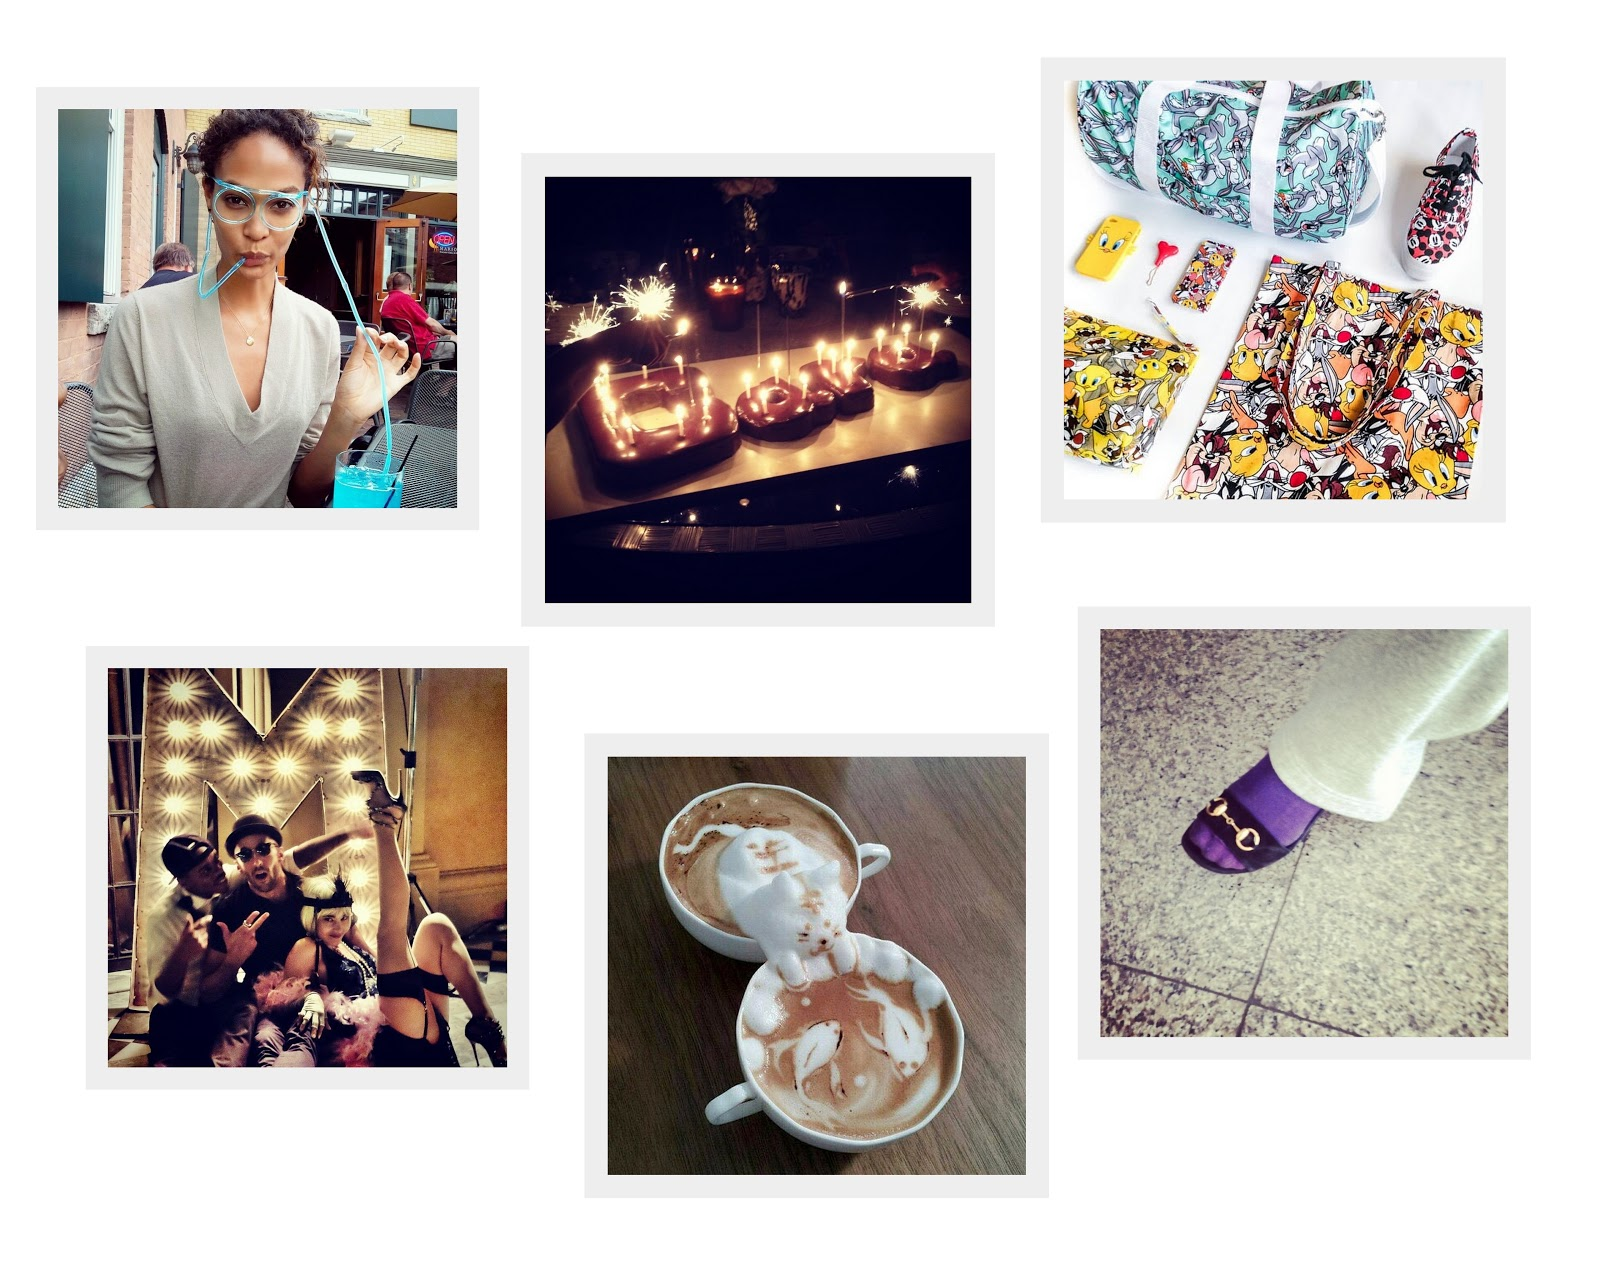 joan smalls, cara delevingne, hm, pixiemarket, madonna, alexa chung, instagram, favourites